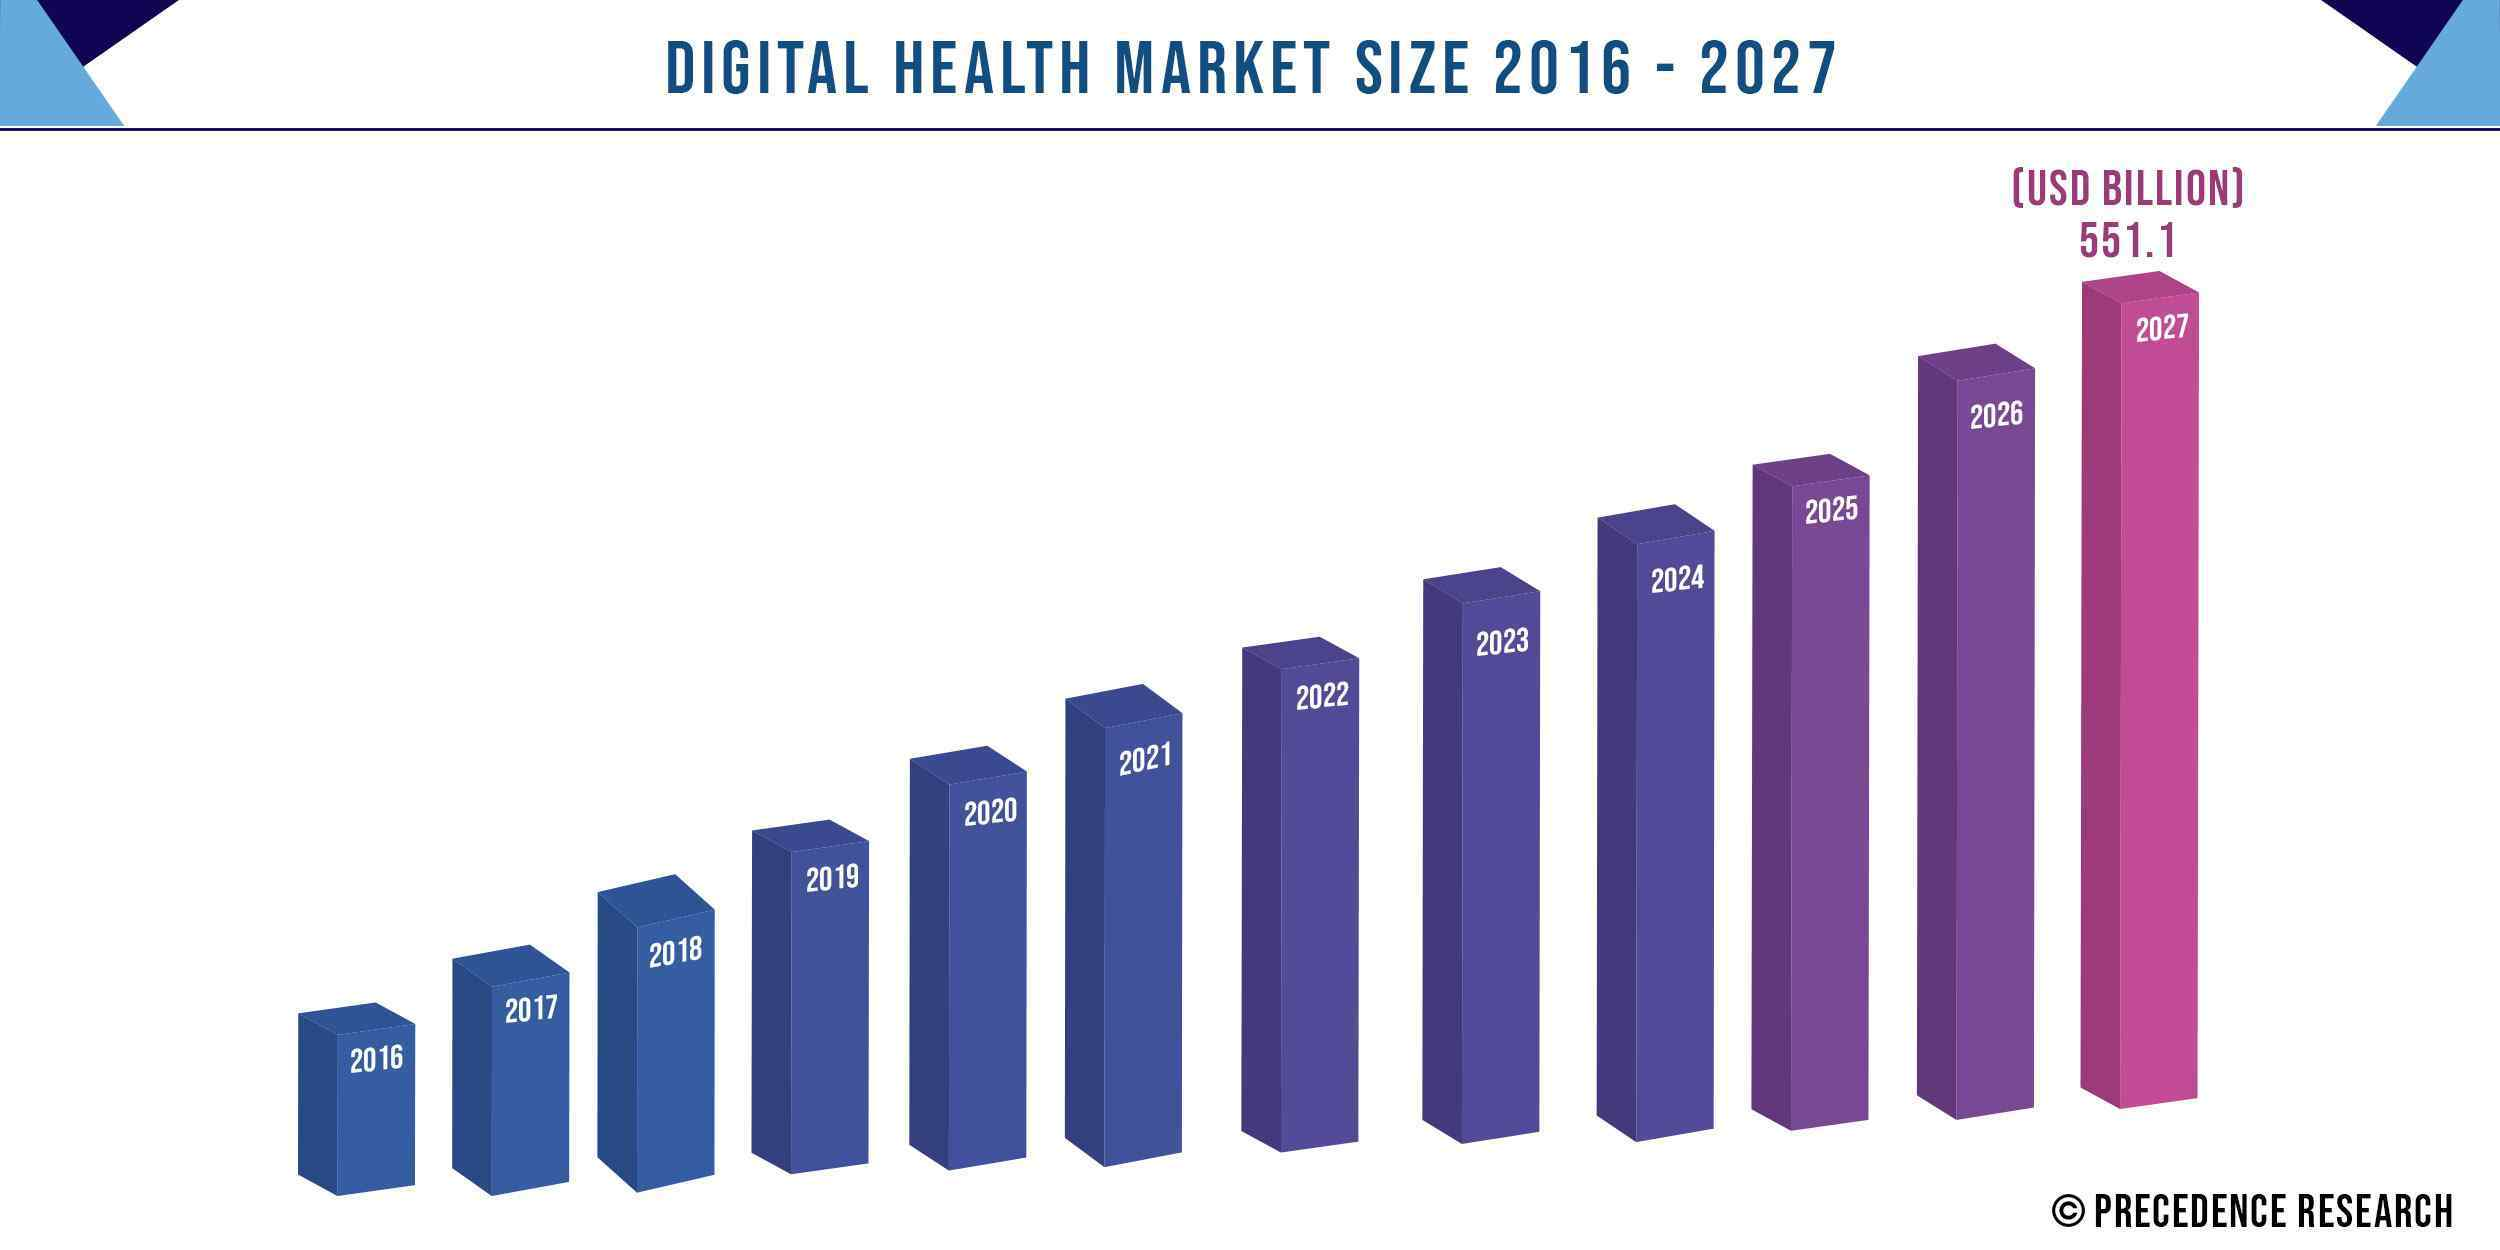 Digital Health Market Size 2016-2027